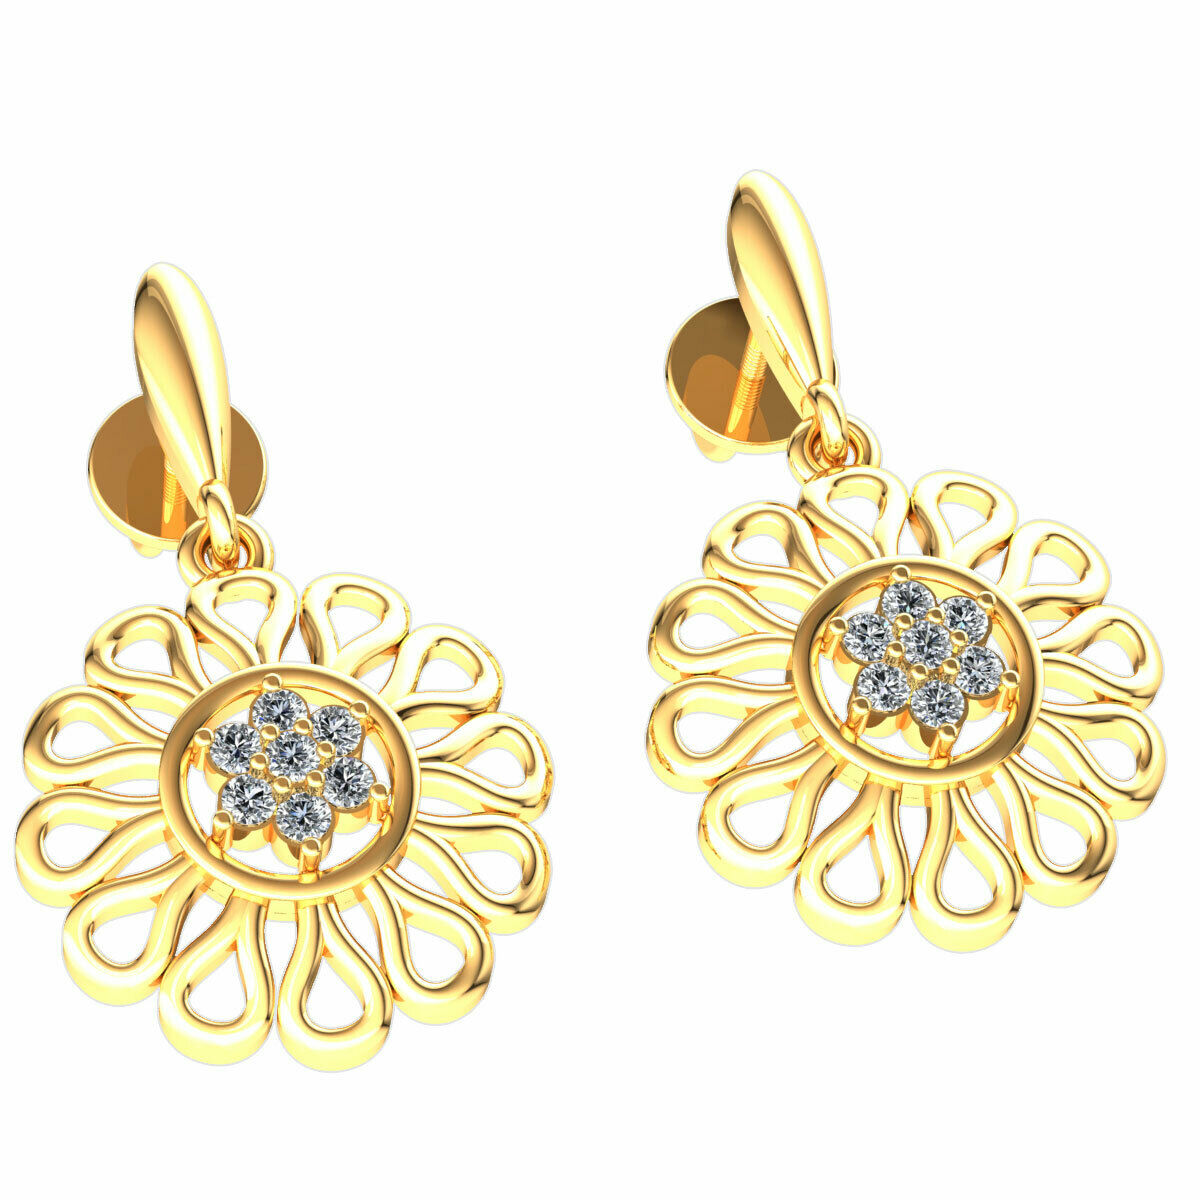 Natural 0.1carat Round Cut Diamond Ladies Flower Dangle Earrings 14K gold